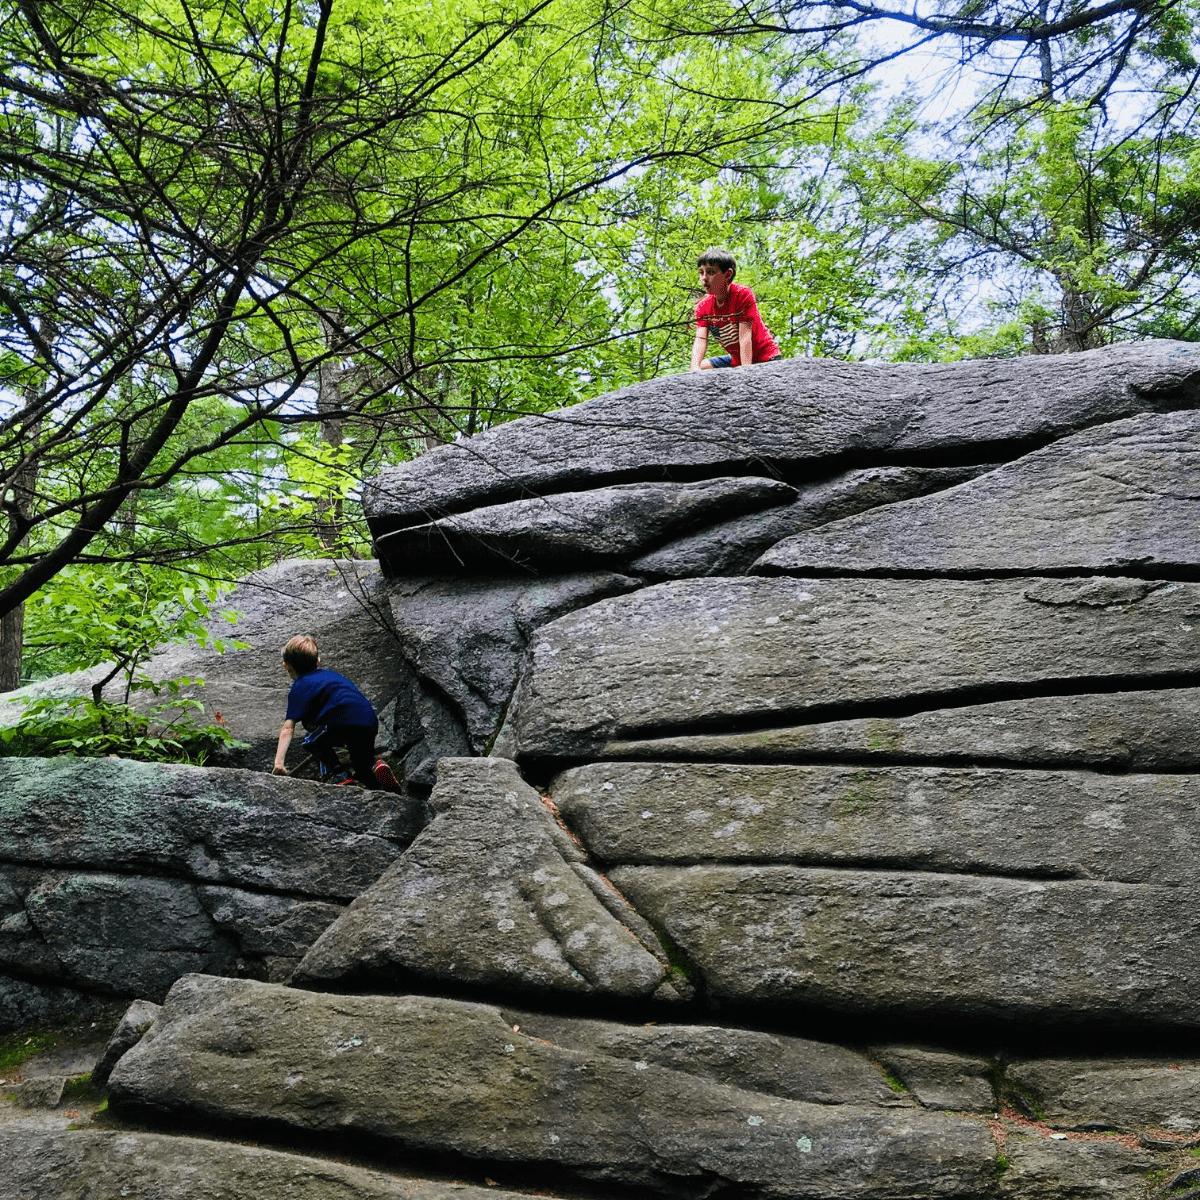 Kids climbing up a large boulder while hiking